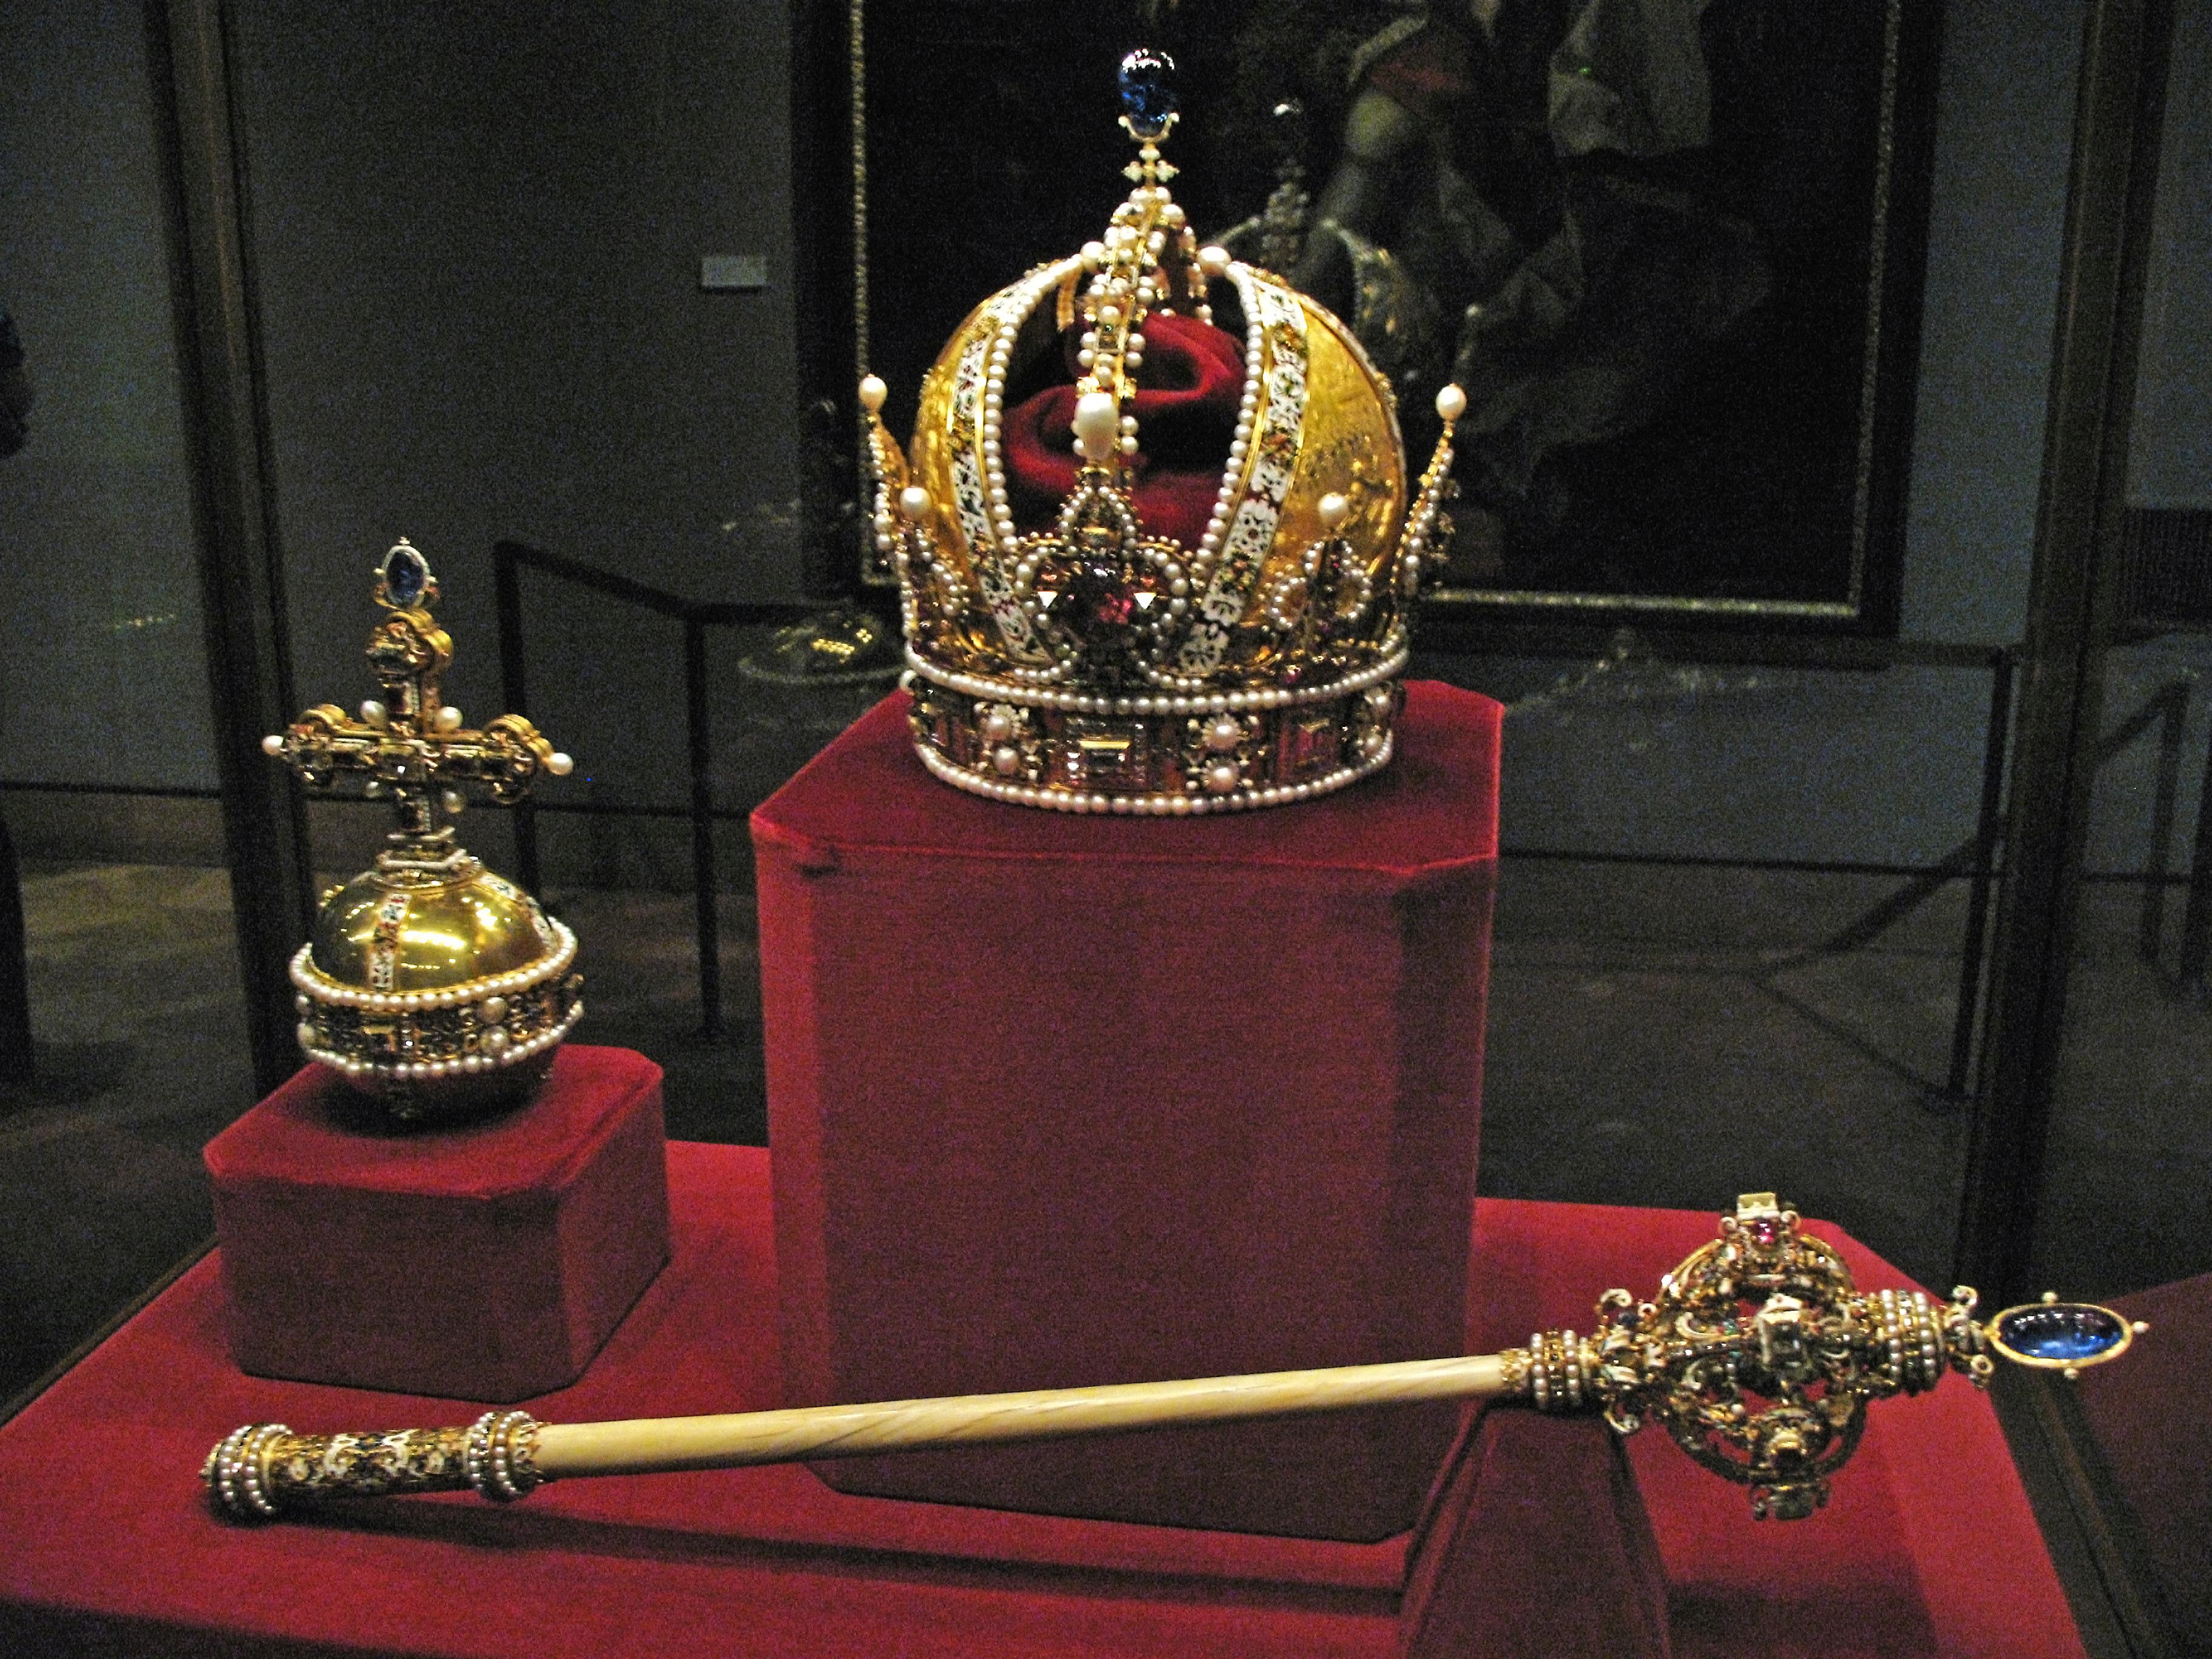 File img 0111 wien schatzkammer crown jewels jpg for King s fish house corona